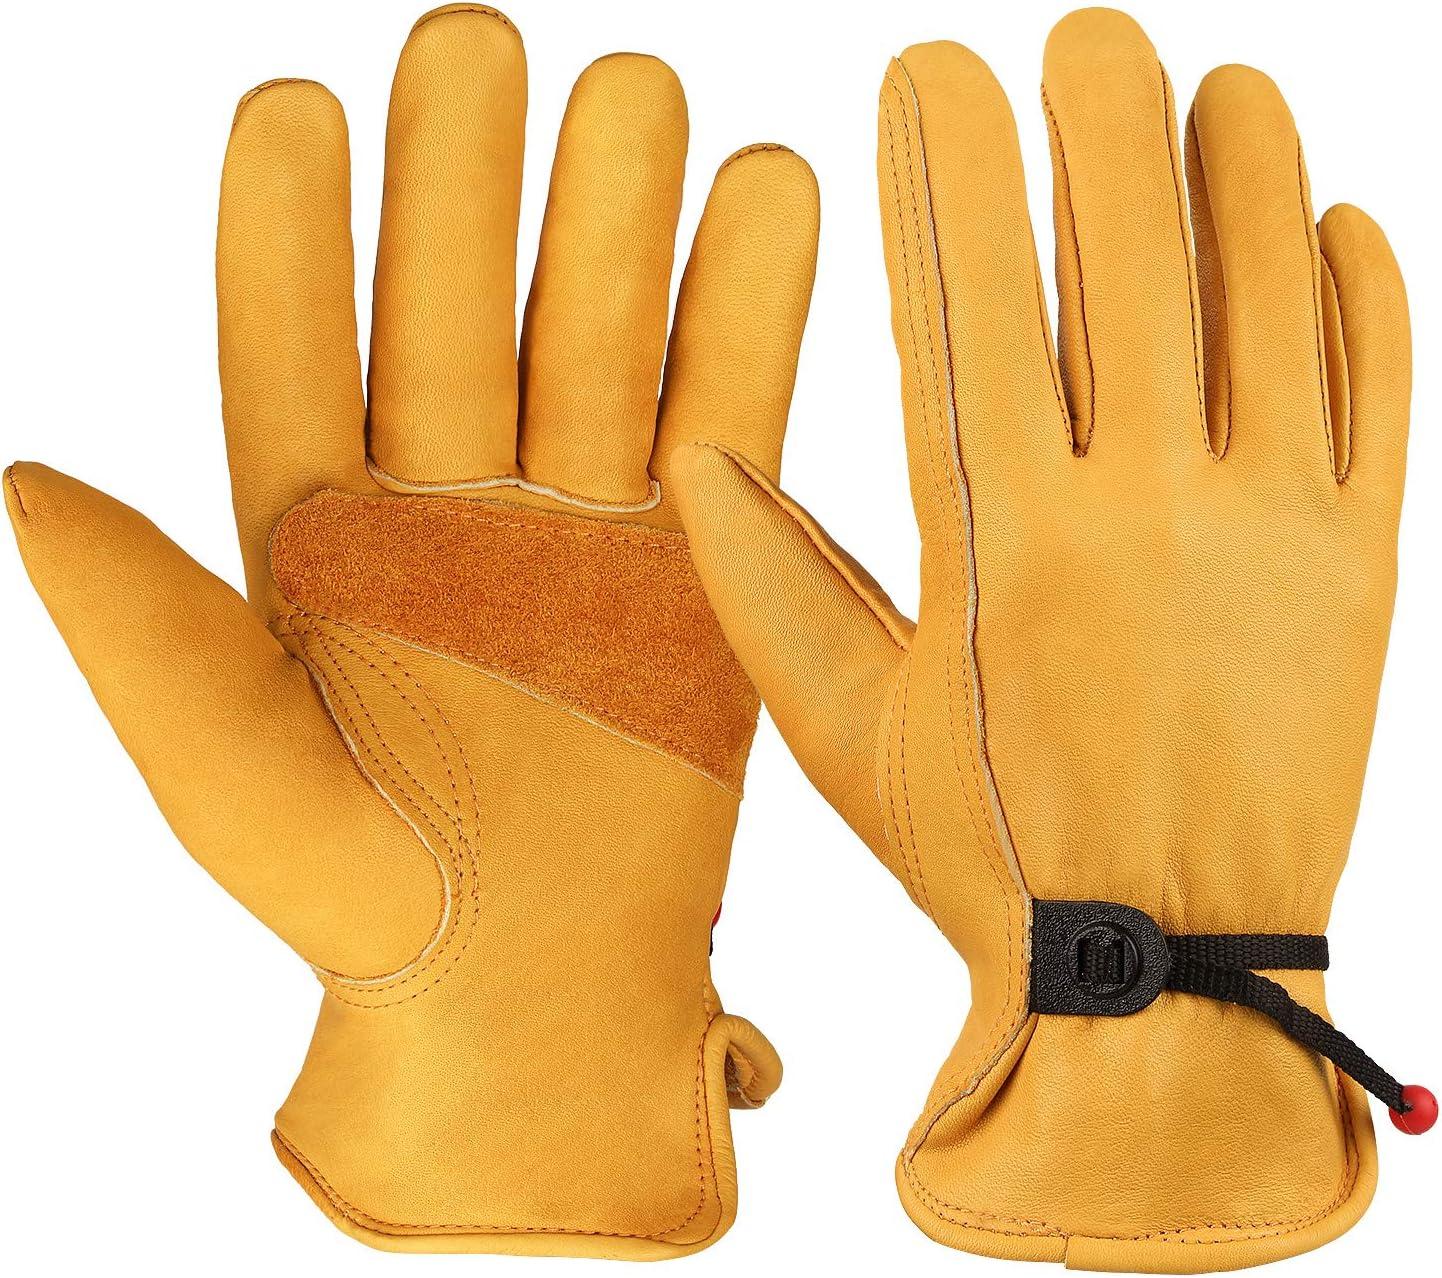 OZERO Flex Grip Leather Work At the price Cowhi Gloves Adjustable Wrist Tough Max 58% OFF